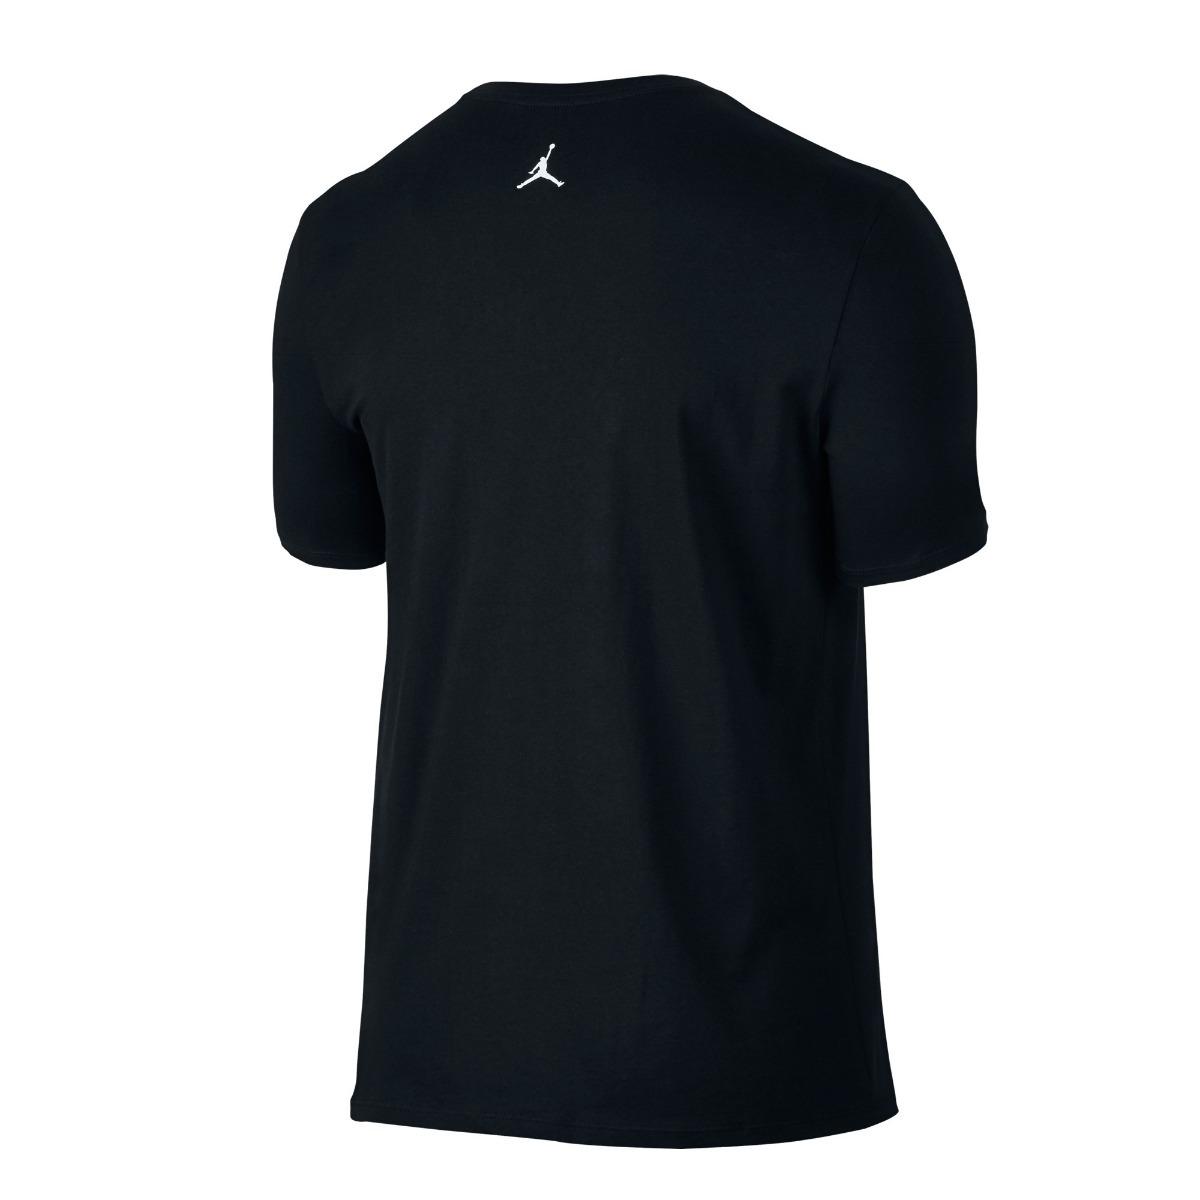 4aefa5fd3cbd5 camiseta nike air jordan no meio da grandeza pronta entrega. Carregando  zoom.